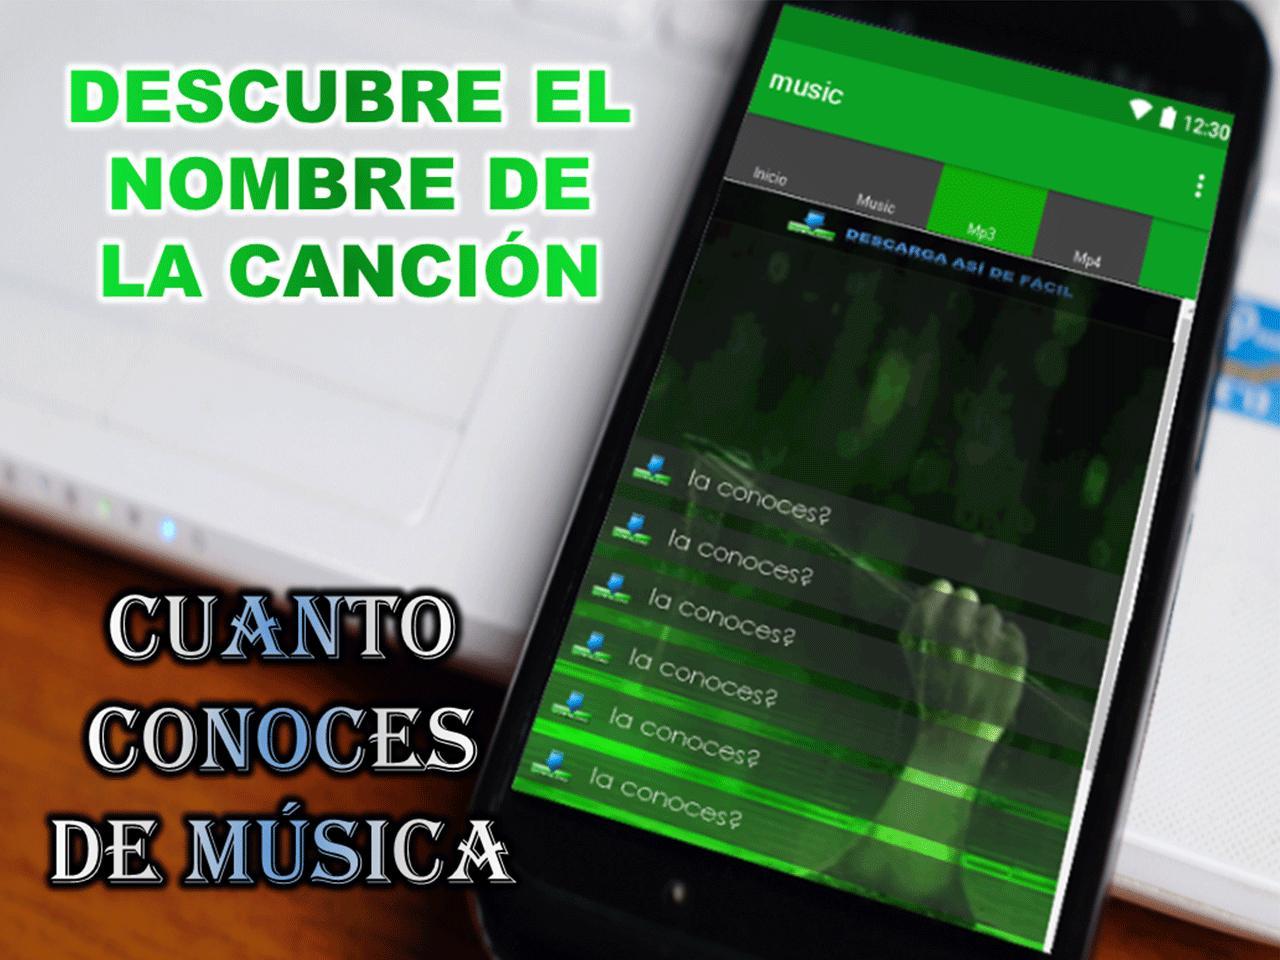 Como Descargar Musica Gratis En Español Guia For Android Apk Download